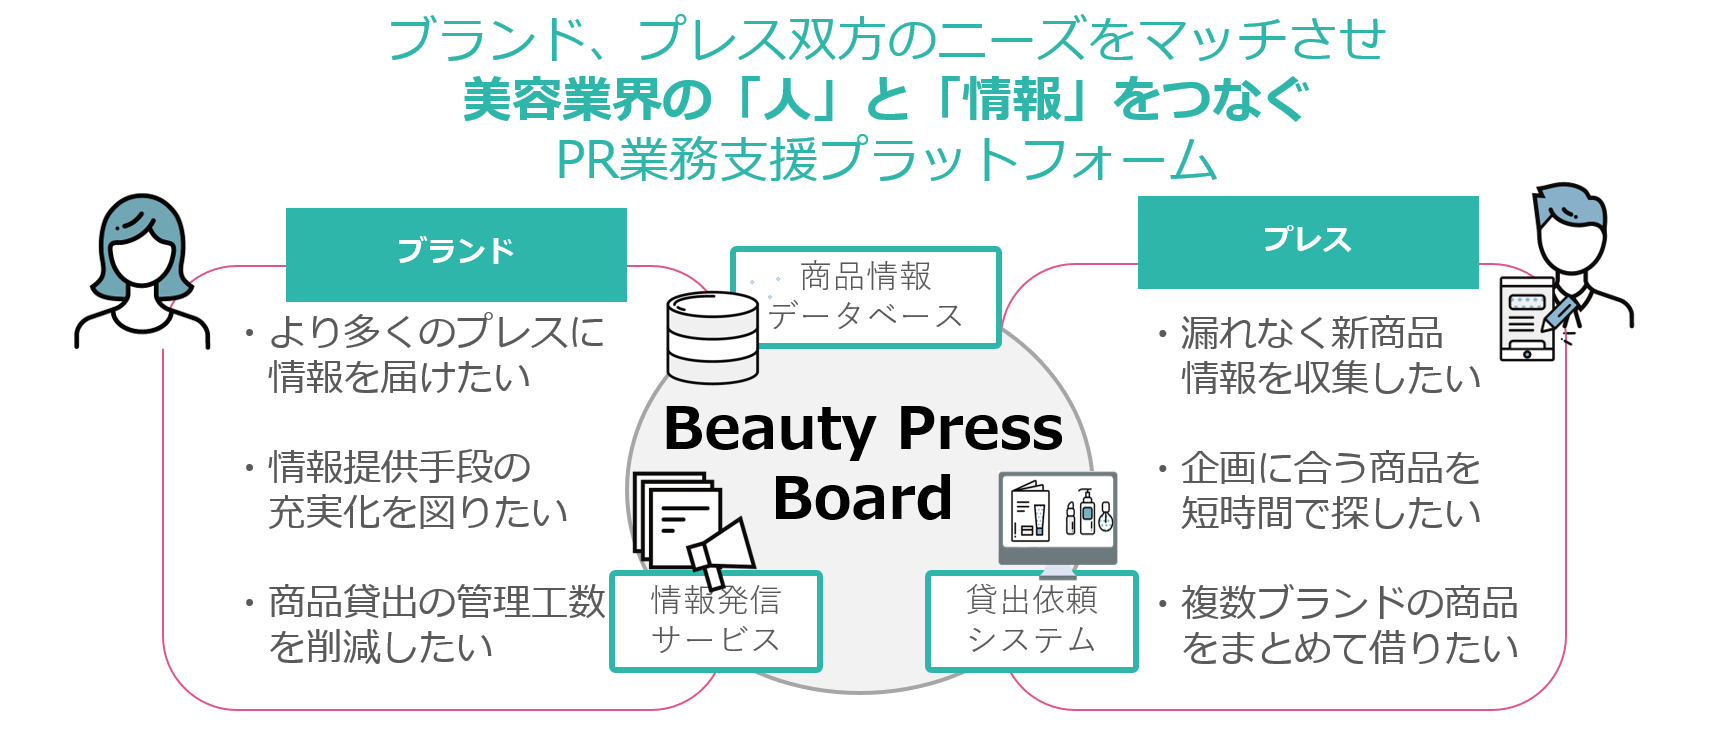 beautypressboard_1